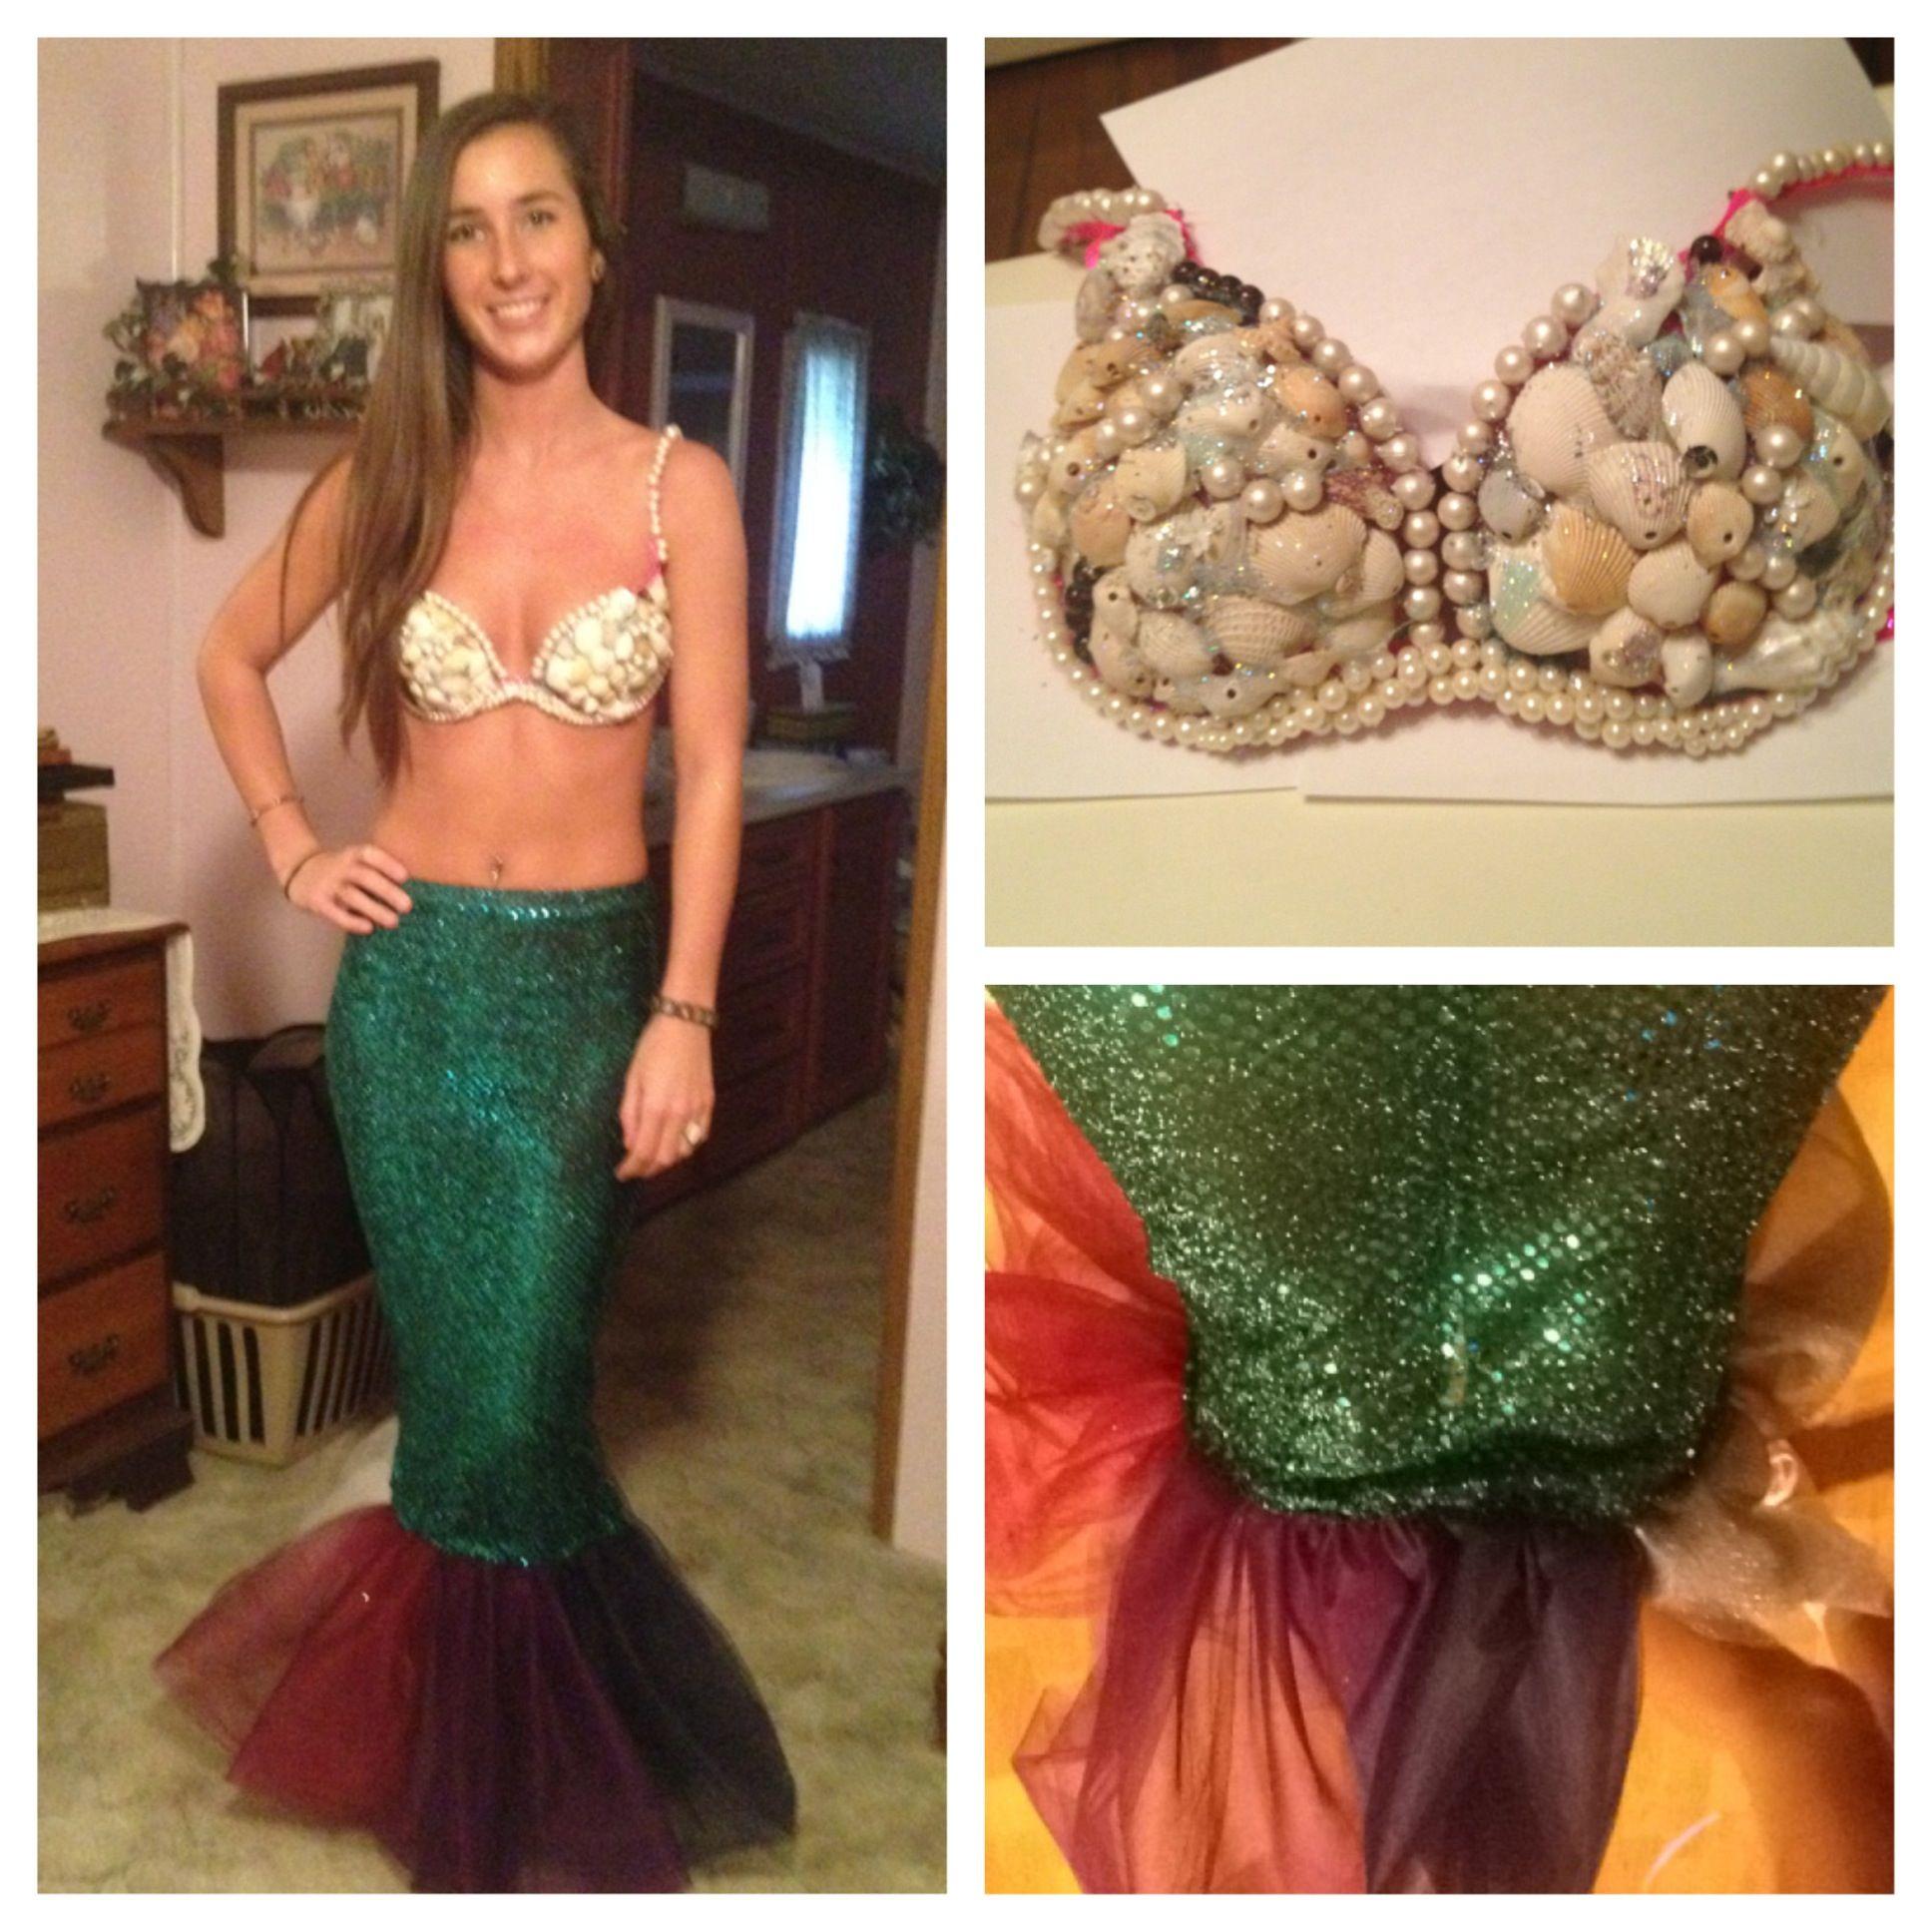 Homemade mermaid costume mermiadcostume halloween take homemade mermaid costume mermiadcostume halloween diy solutioingenieria Choice Image